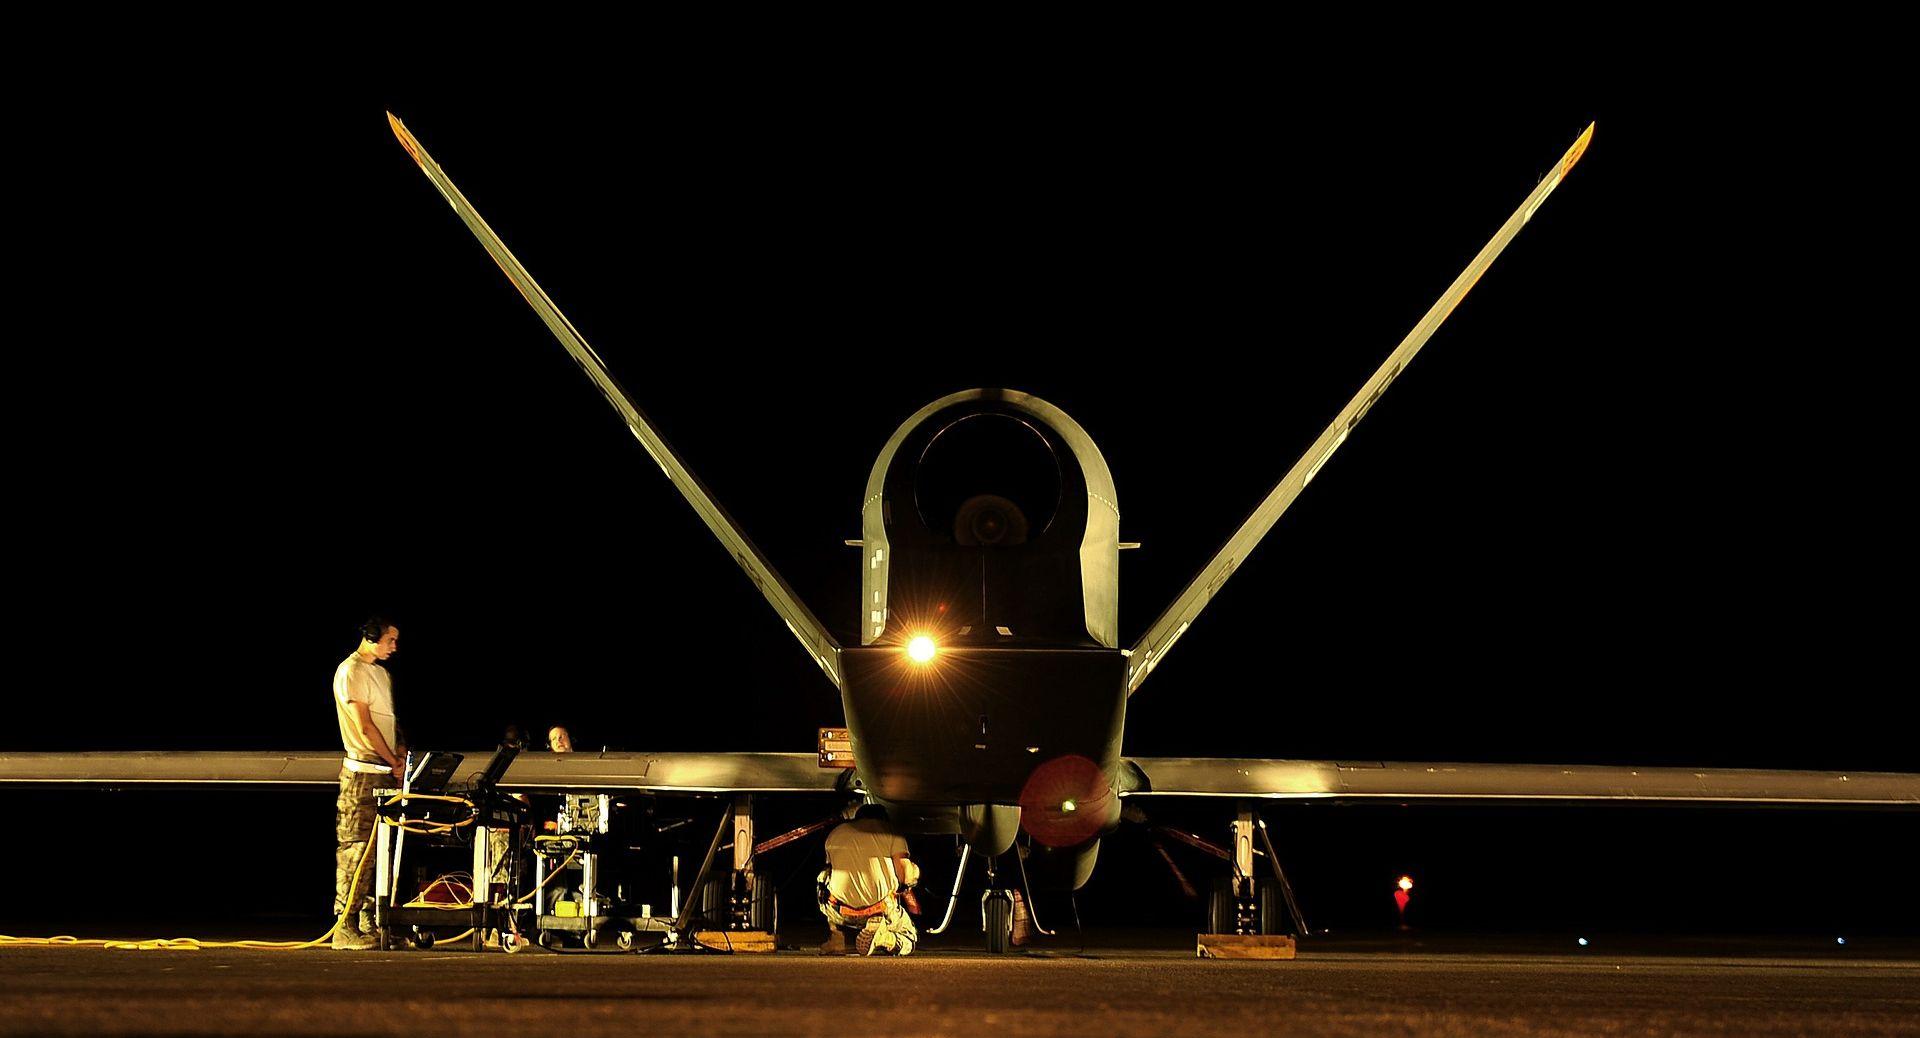 Sirijska vojska koristi ruske bespilotne letjelice